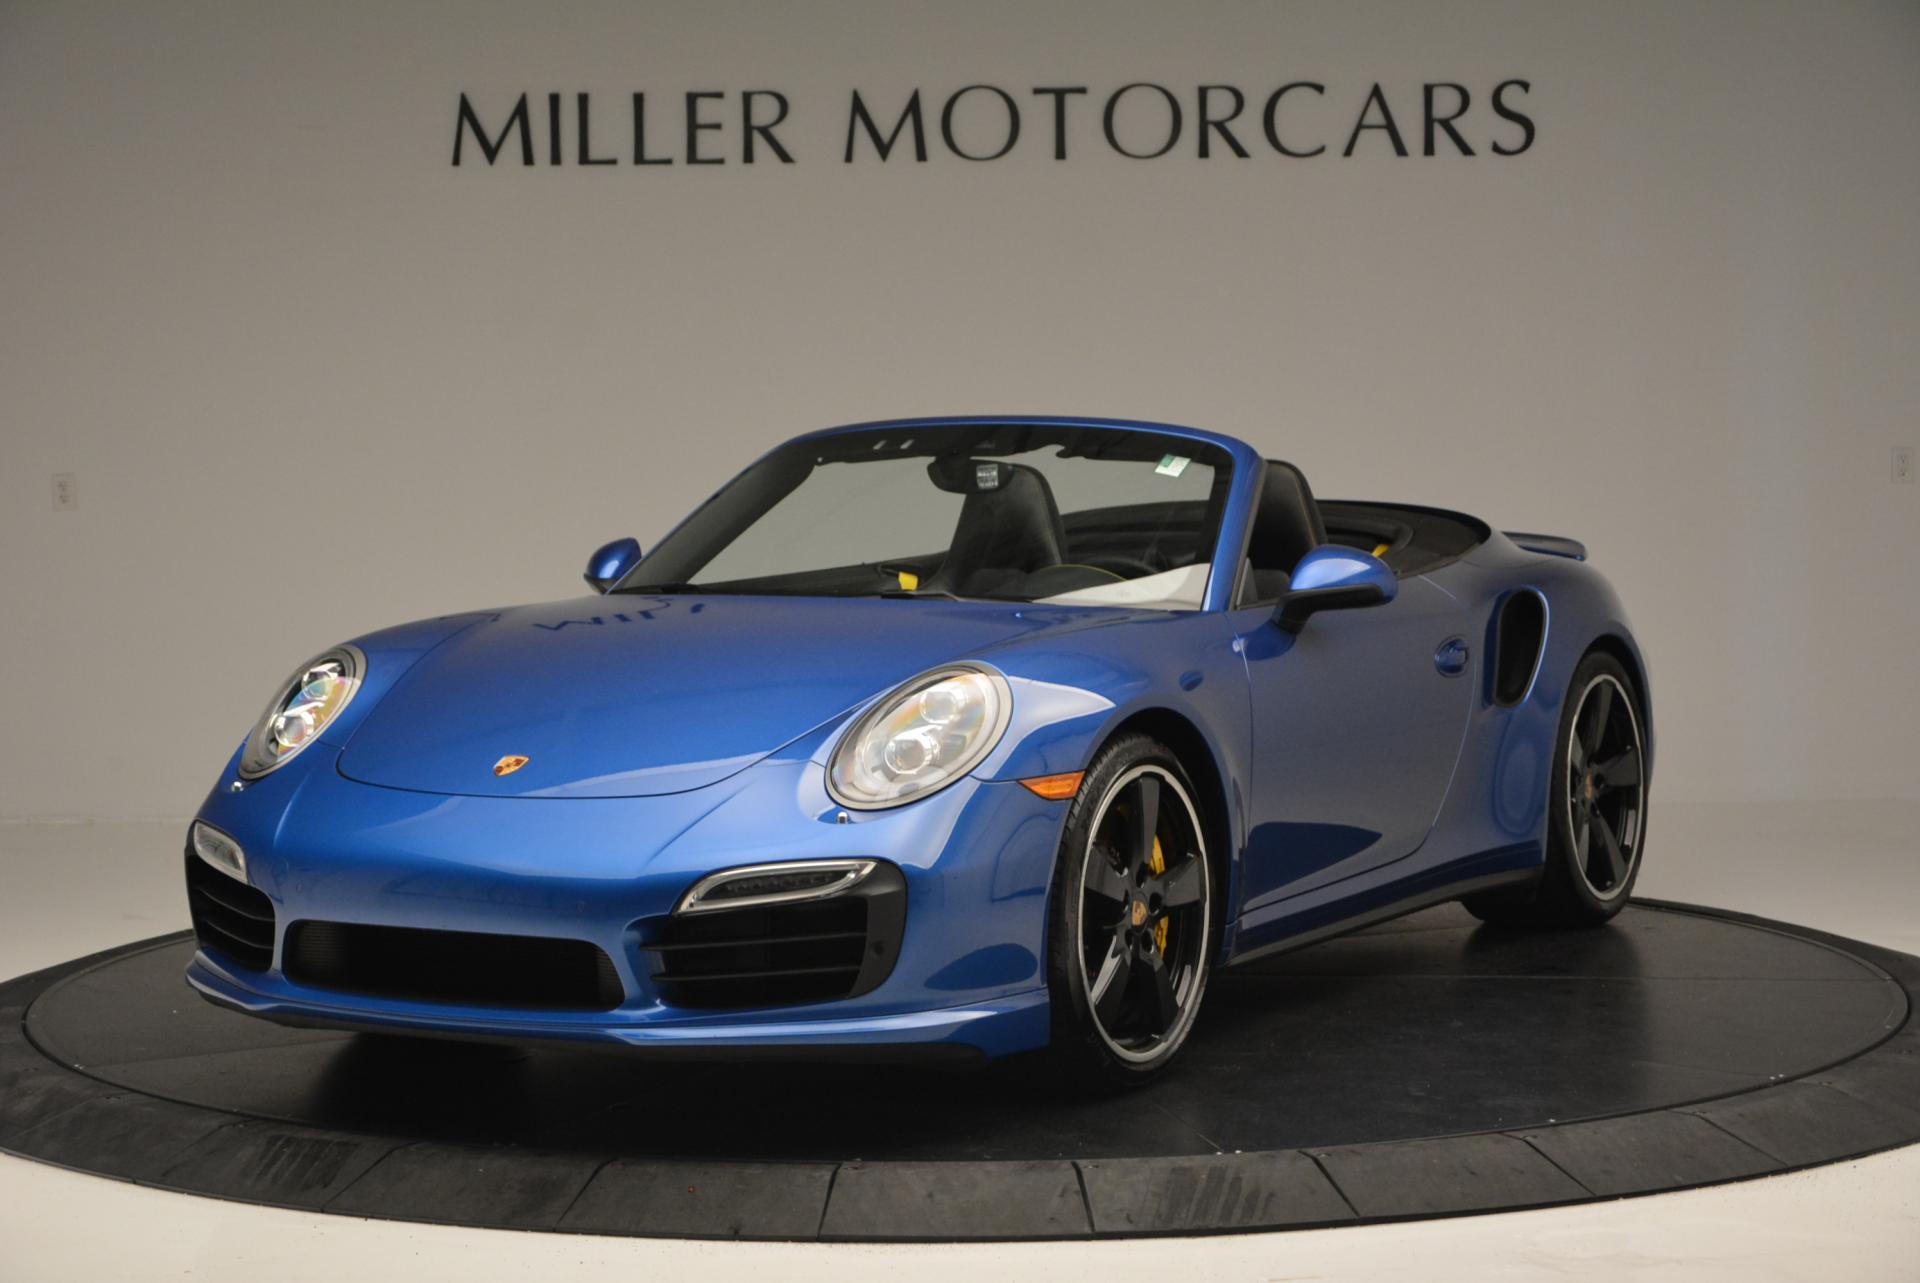 Used 2014 Porsche 911 Turbo S for sale Sold at Alfa Romeo of Westport in Westport CT 06880 1